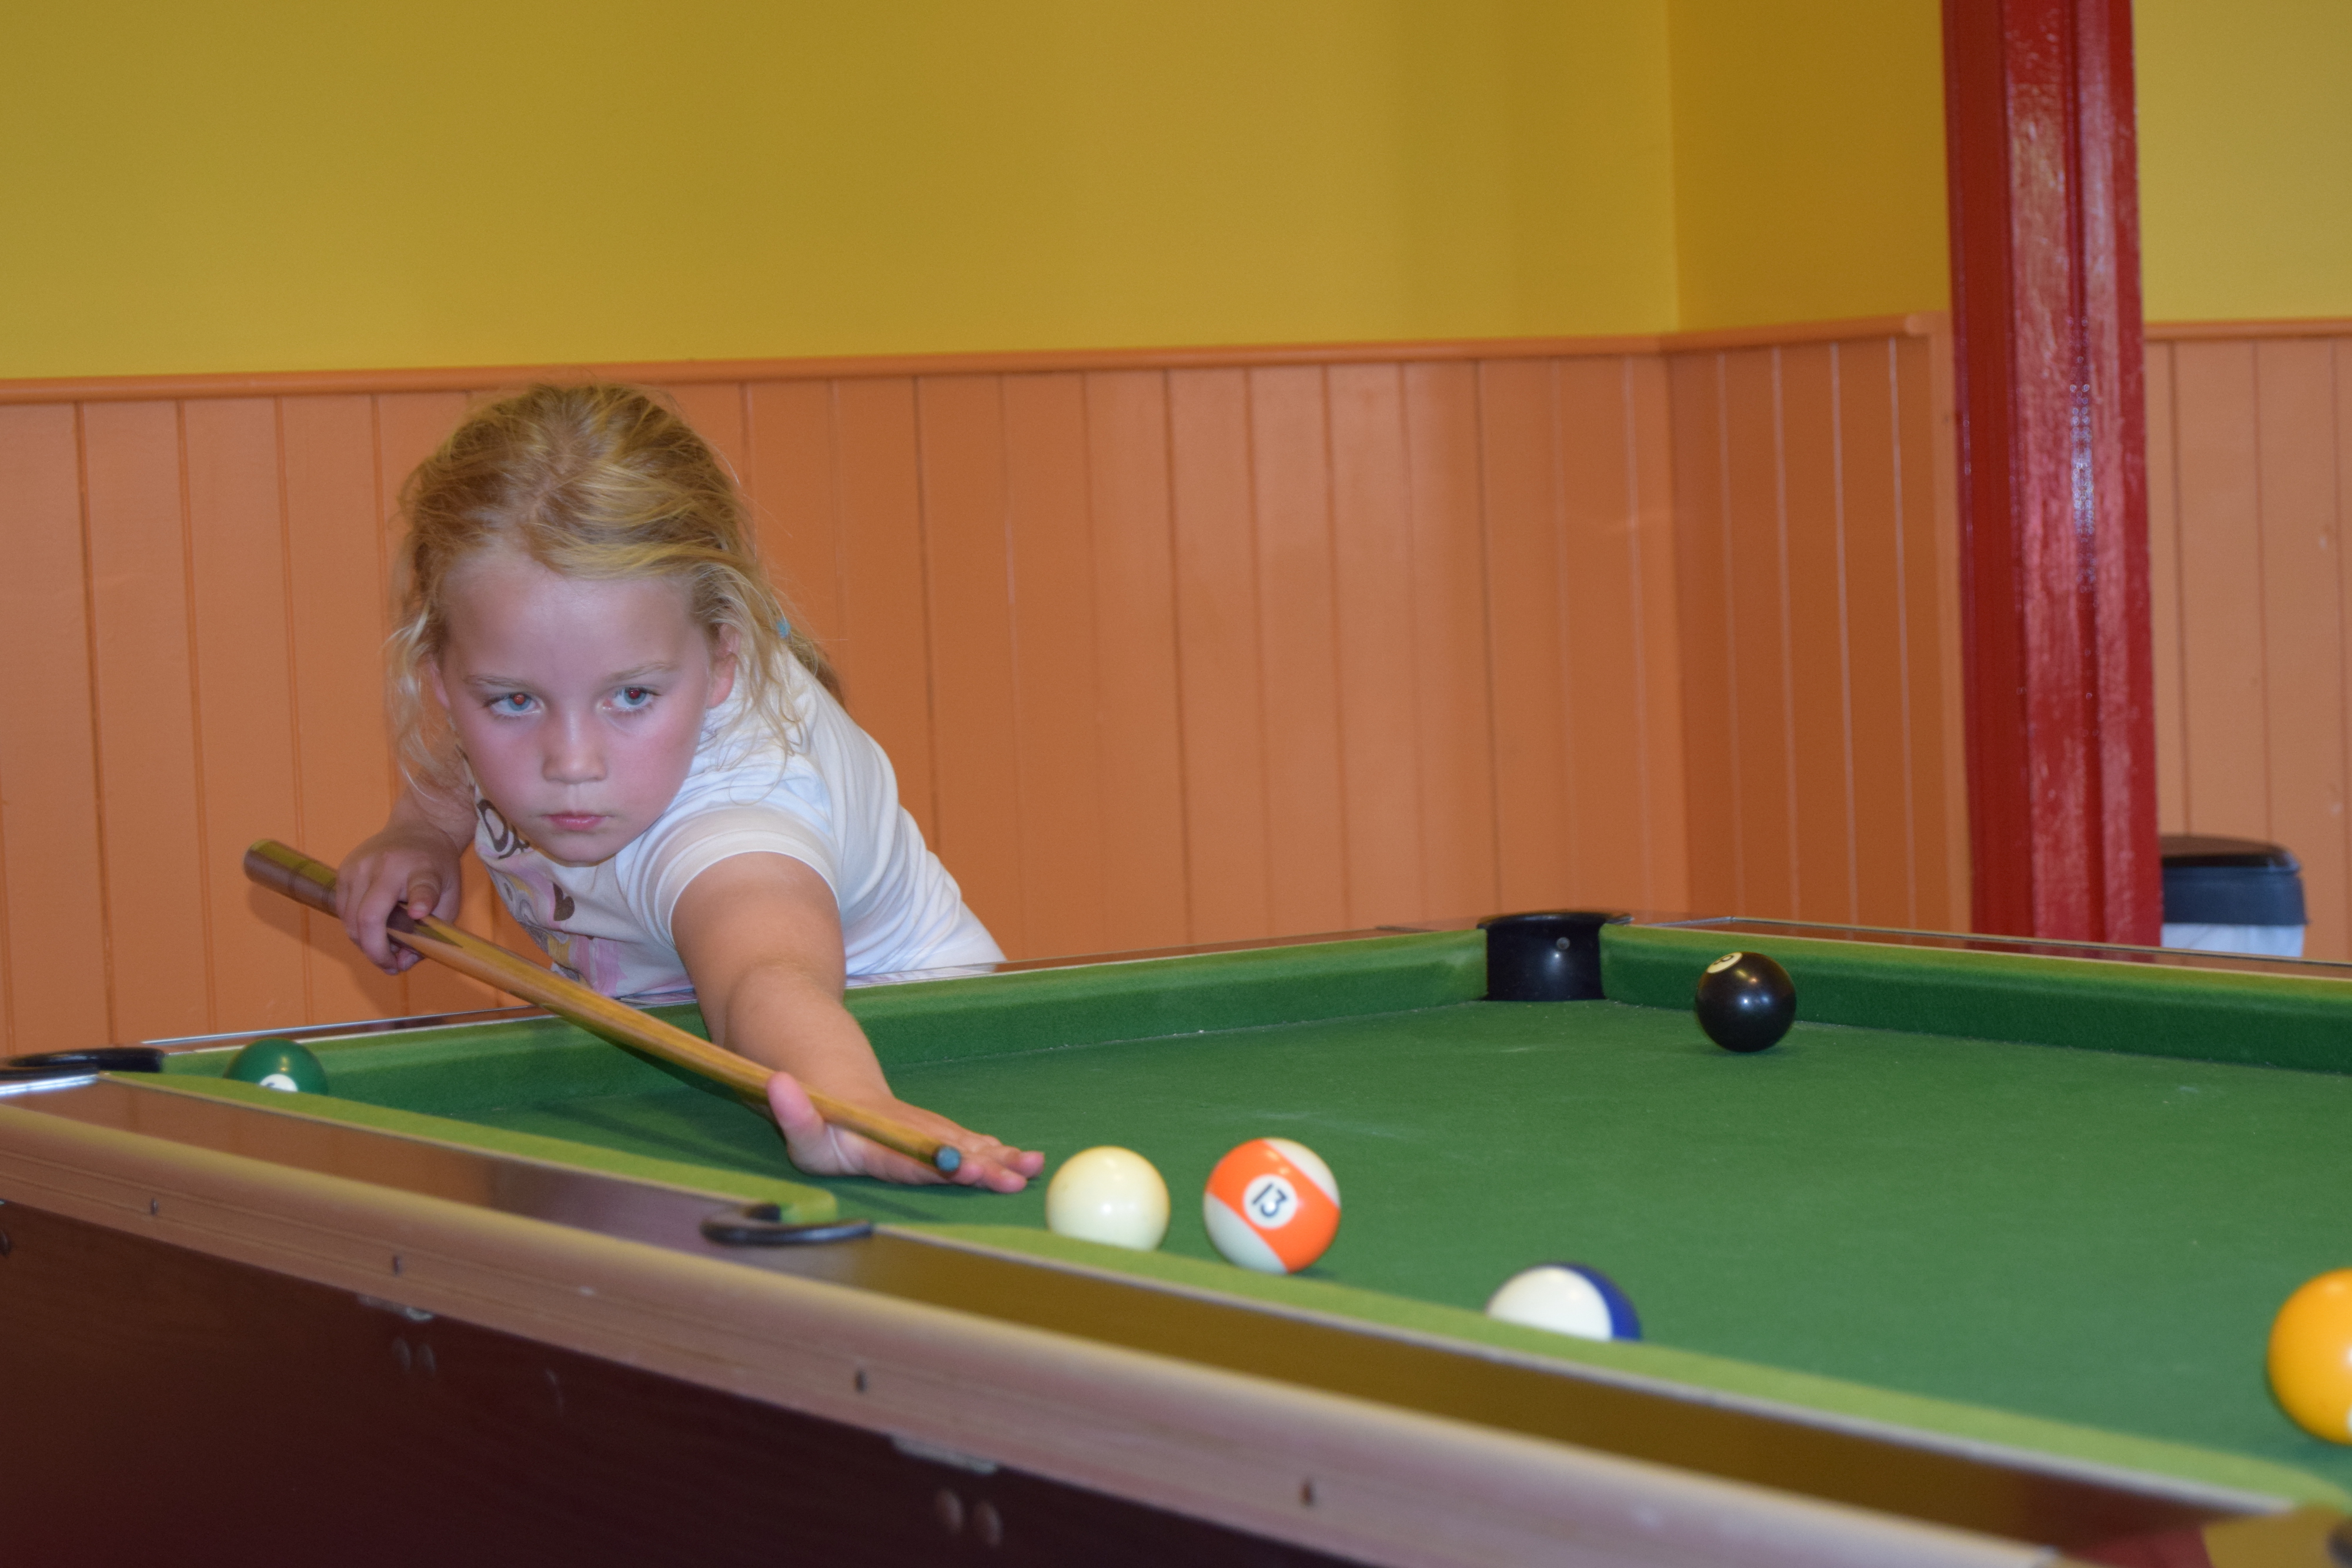 Broadhembury Game Room, Family-friendly Park